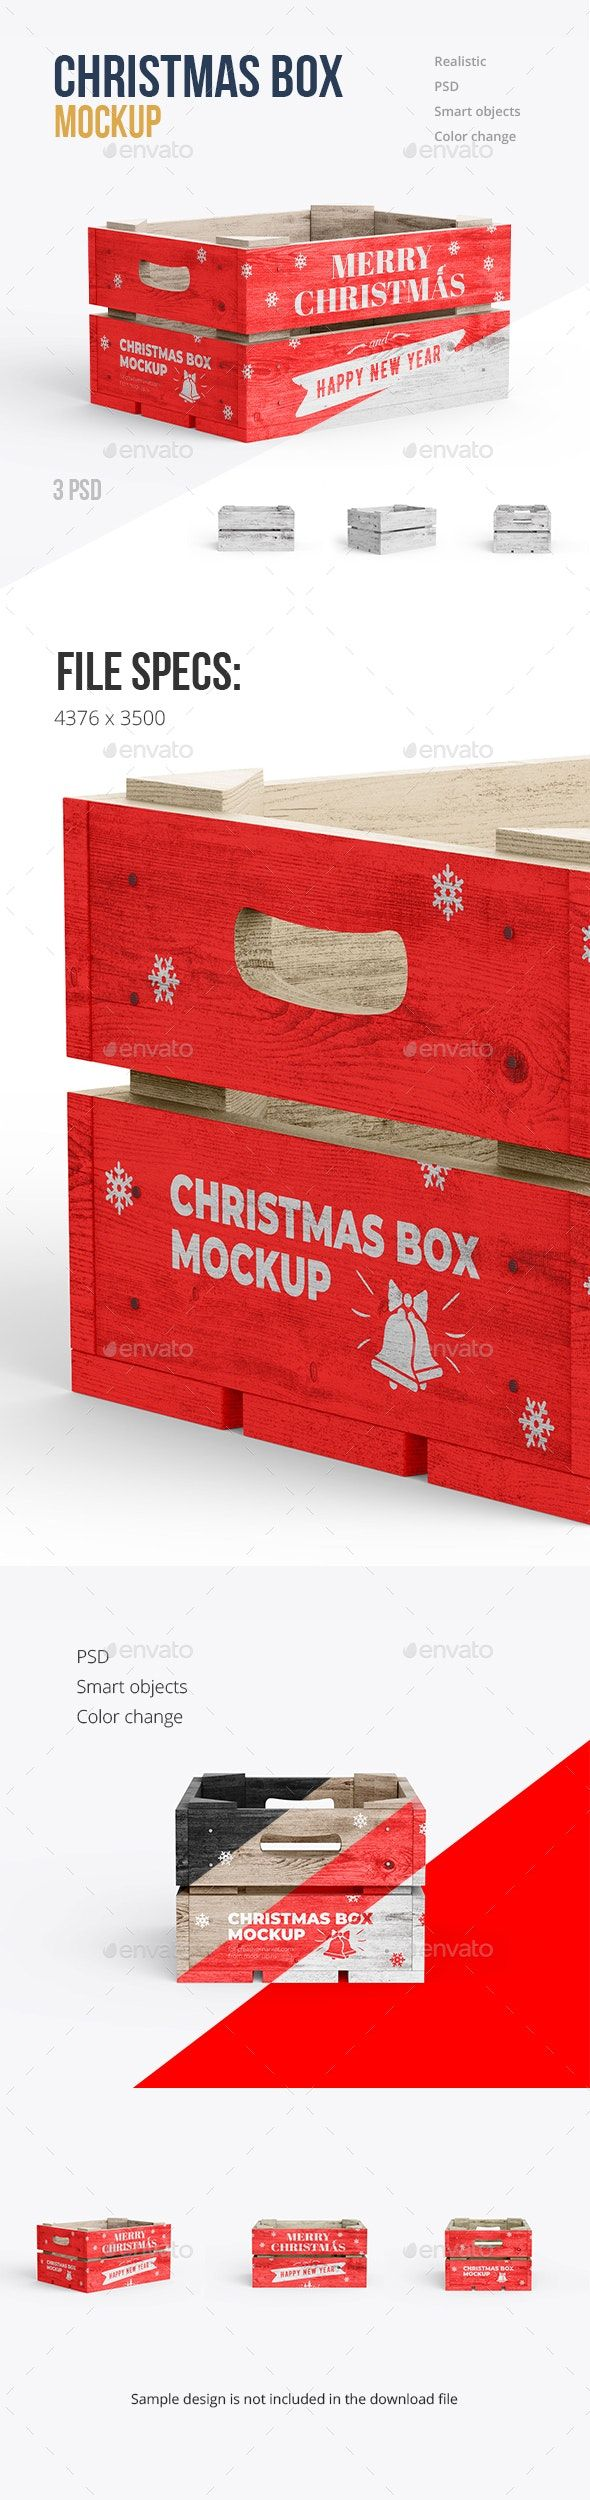 Download Christmas Box Mockup 3 Psd Box Mockup Christmas Box Graphic Design Templates